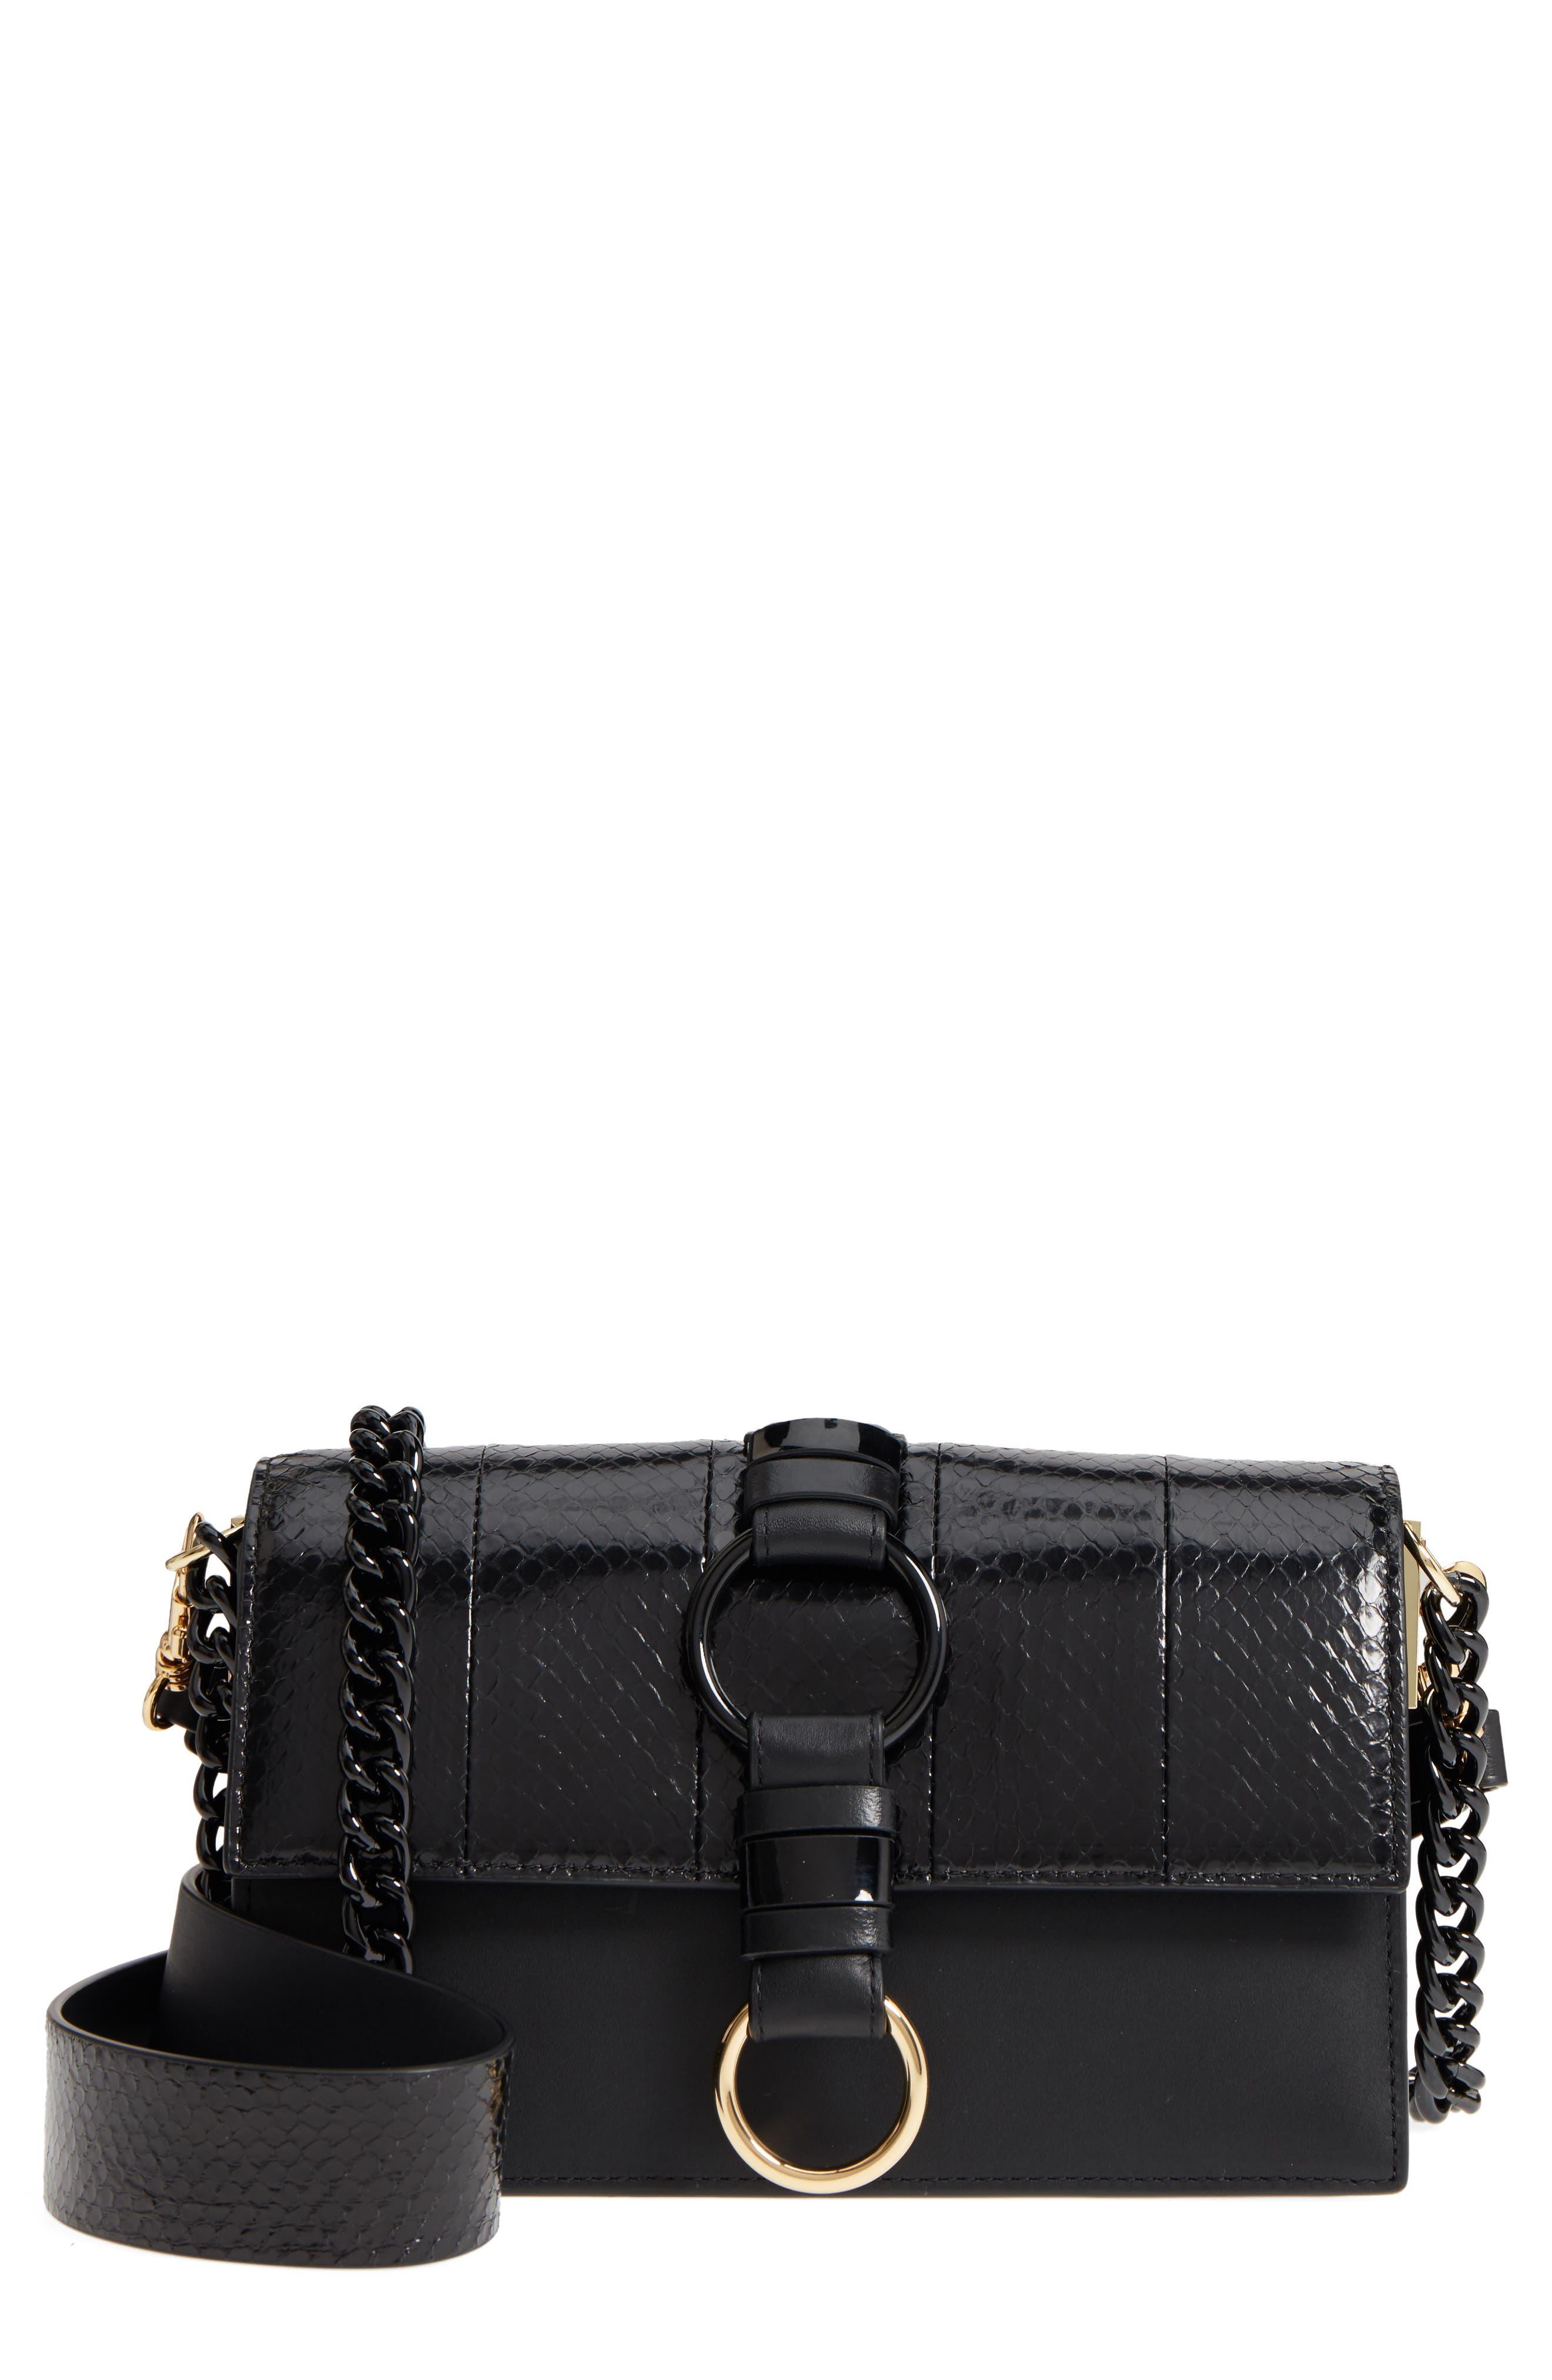 Diane von Furstenberg Bonne Journée Leather & Genuine Snakeskin Crossbody Bag